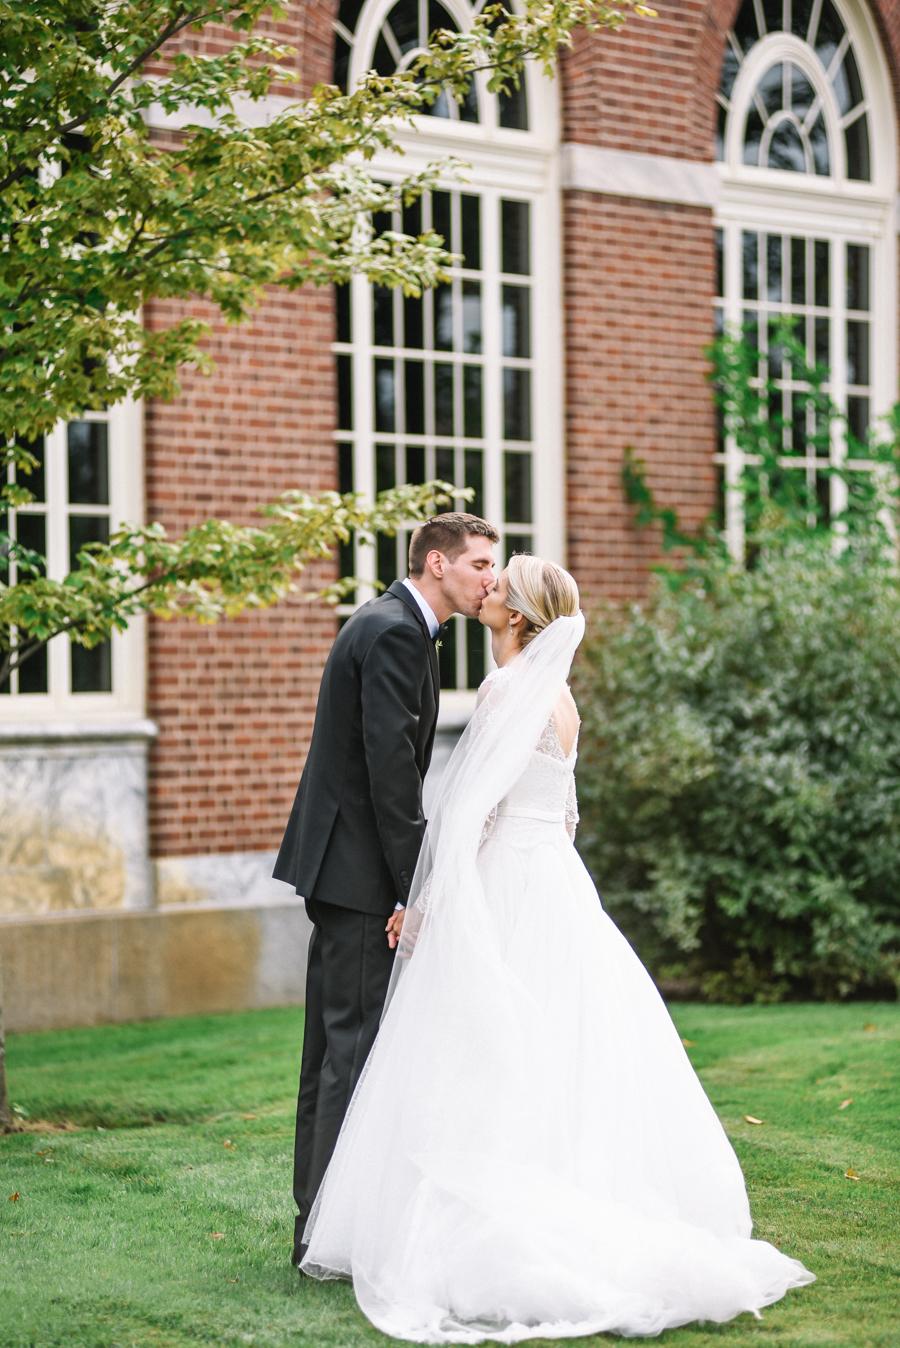 Henry_Ford__Lovett_Hall_Wedding_Detroit-23.jpg